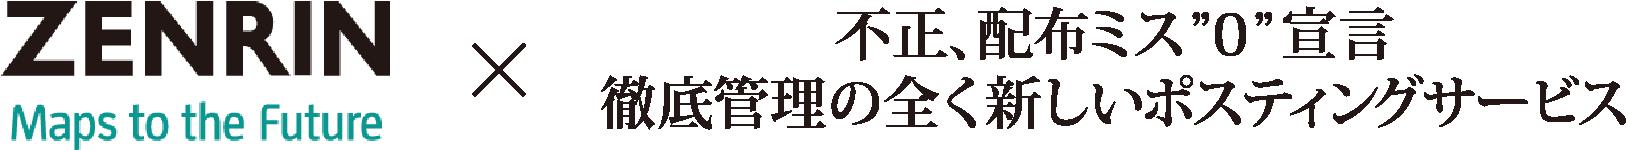 "ZENRIN×不正、配布ミス""0""宣言 徹底管理の全く新しいポスティングサービス"